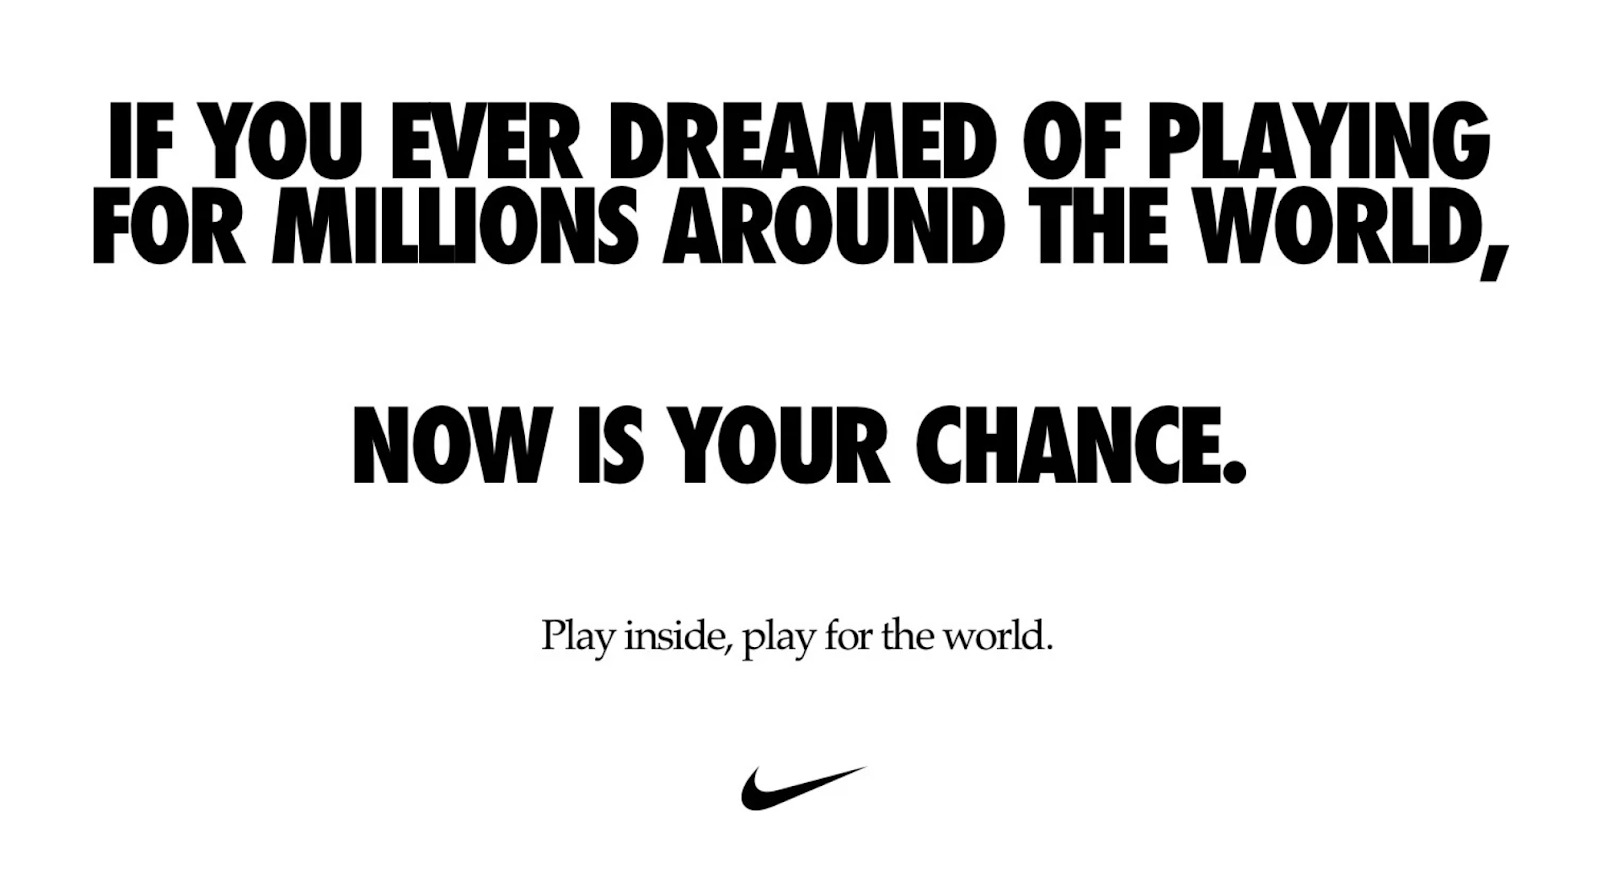 Nike Play Inside